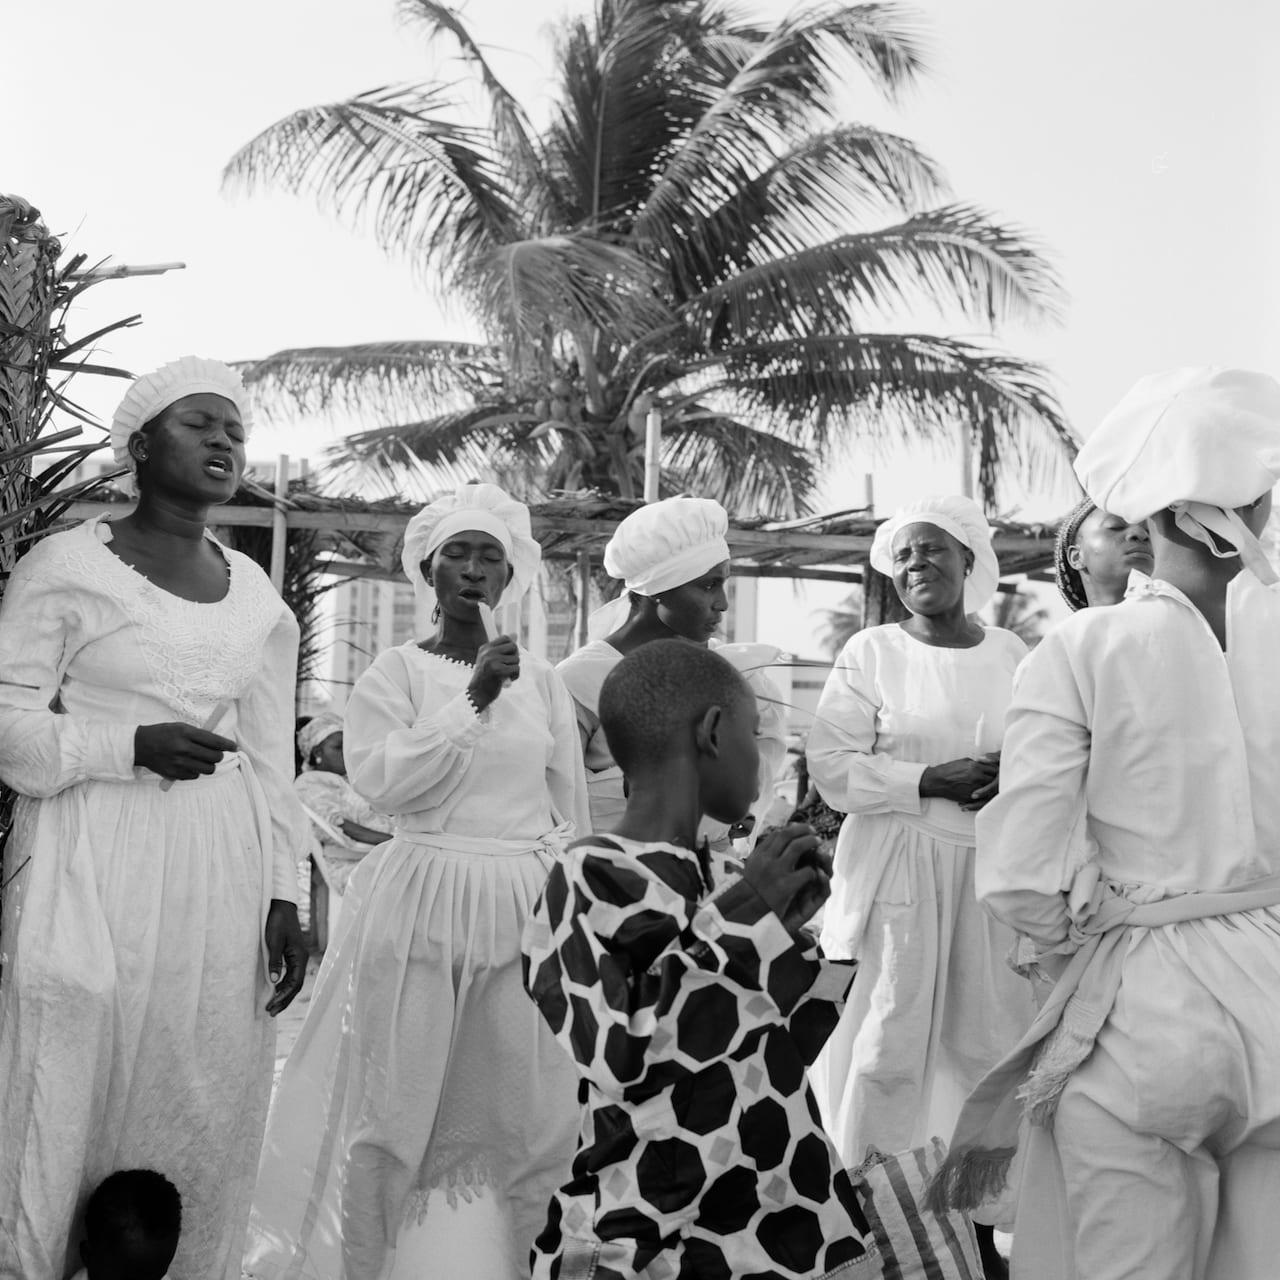 Akinbode Akinbiyi: Six Songs, Swirling Gracefully in the Taut Air